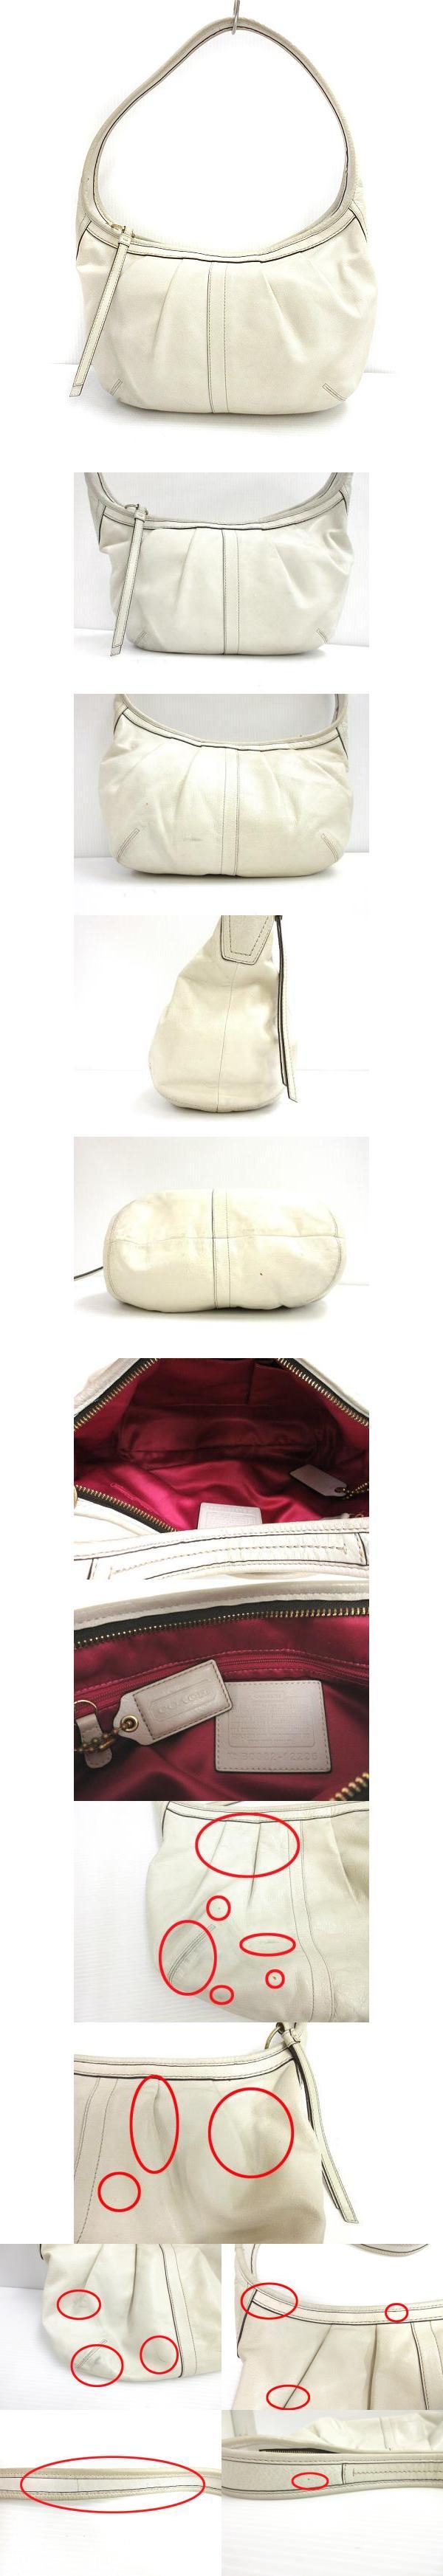 86eb497c8f48 ワン ショルダー バッグ エルゴ レザー プリーテドホーボー オフホワイト 12235 カバン 鞄